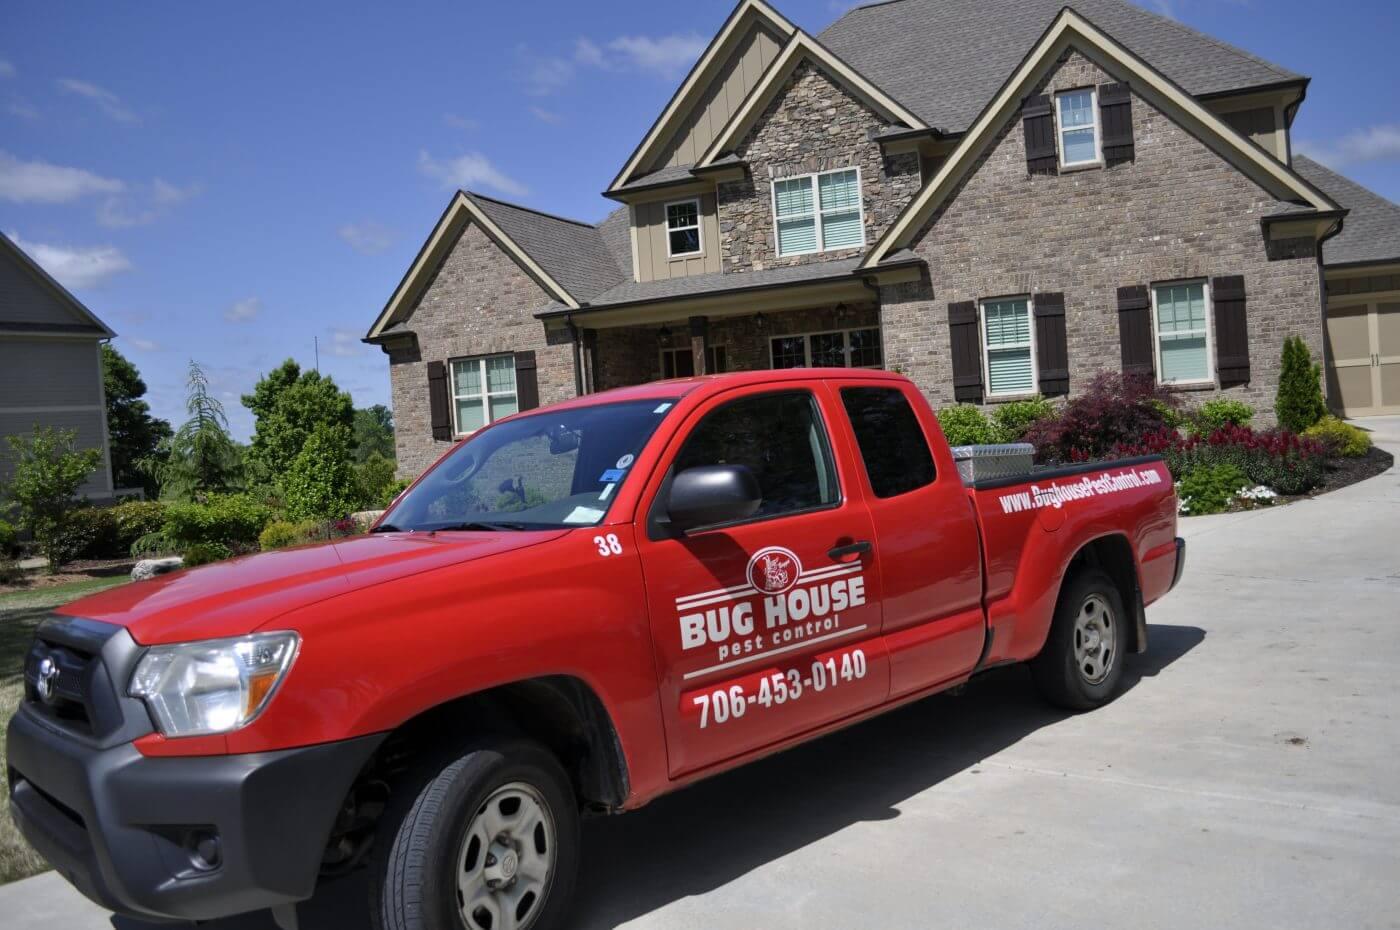 Augusta pest control truck